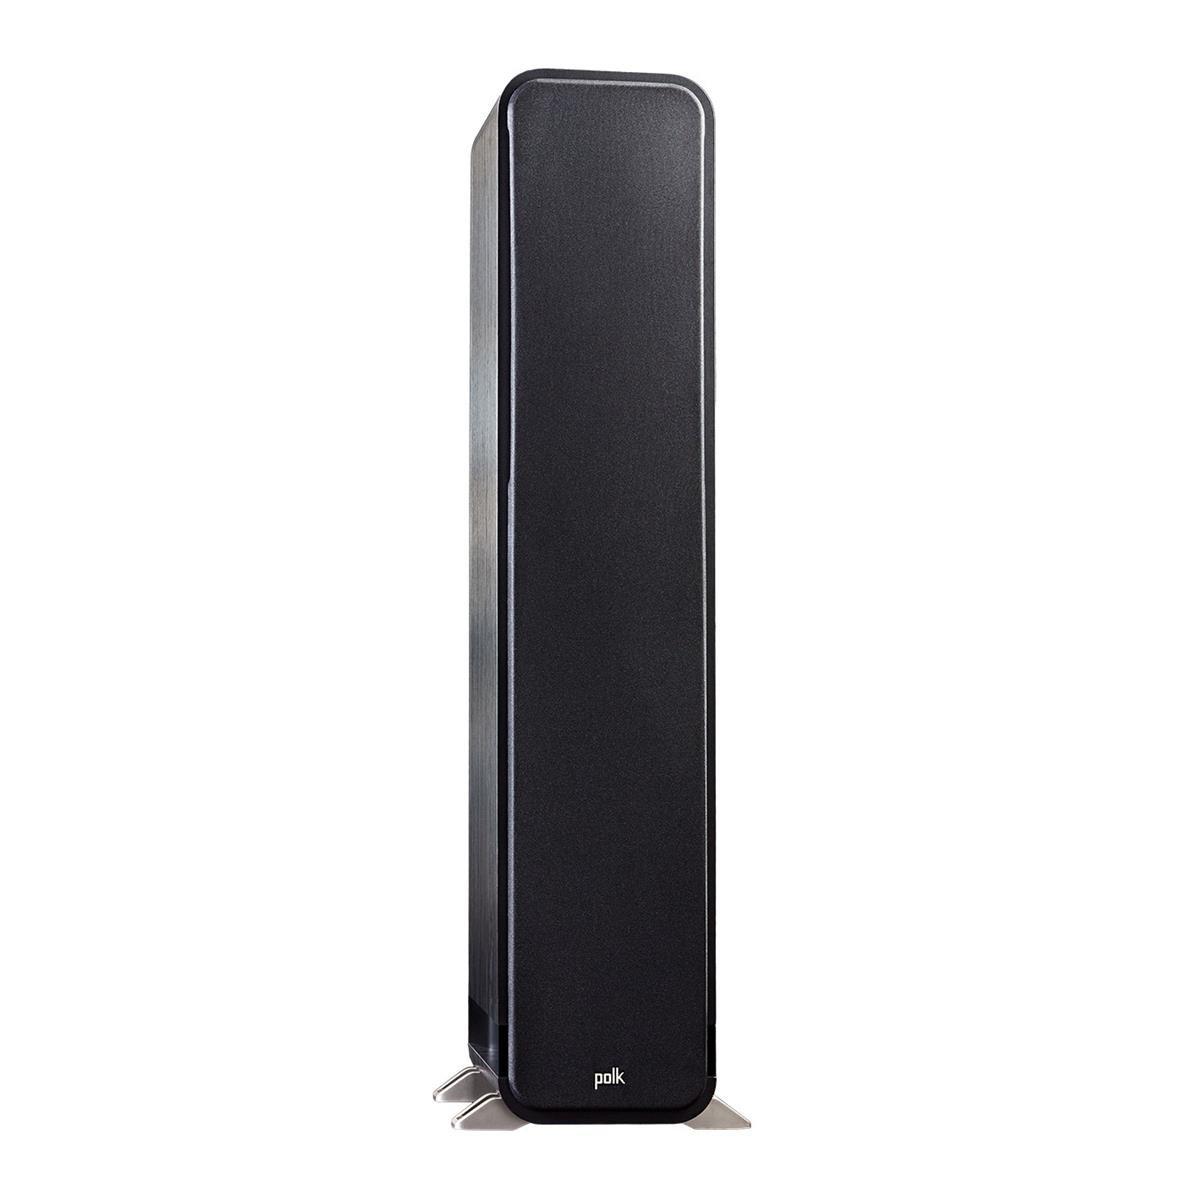 Polk Audio Signature S55 American HiFi Home Theater Tower Speaker